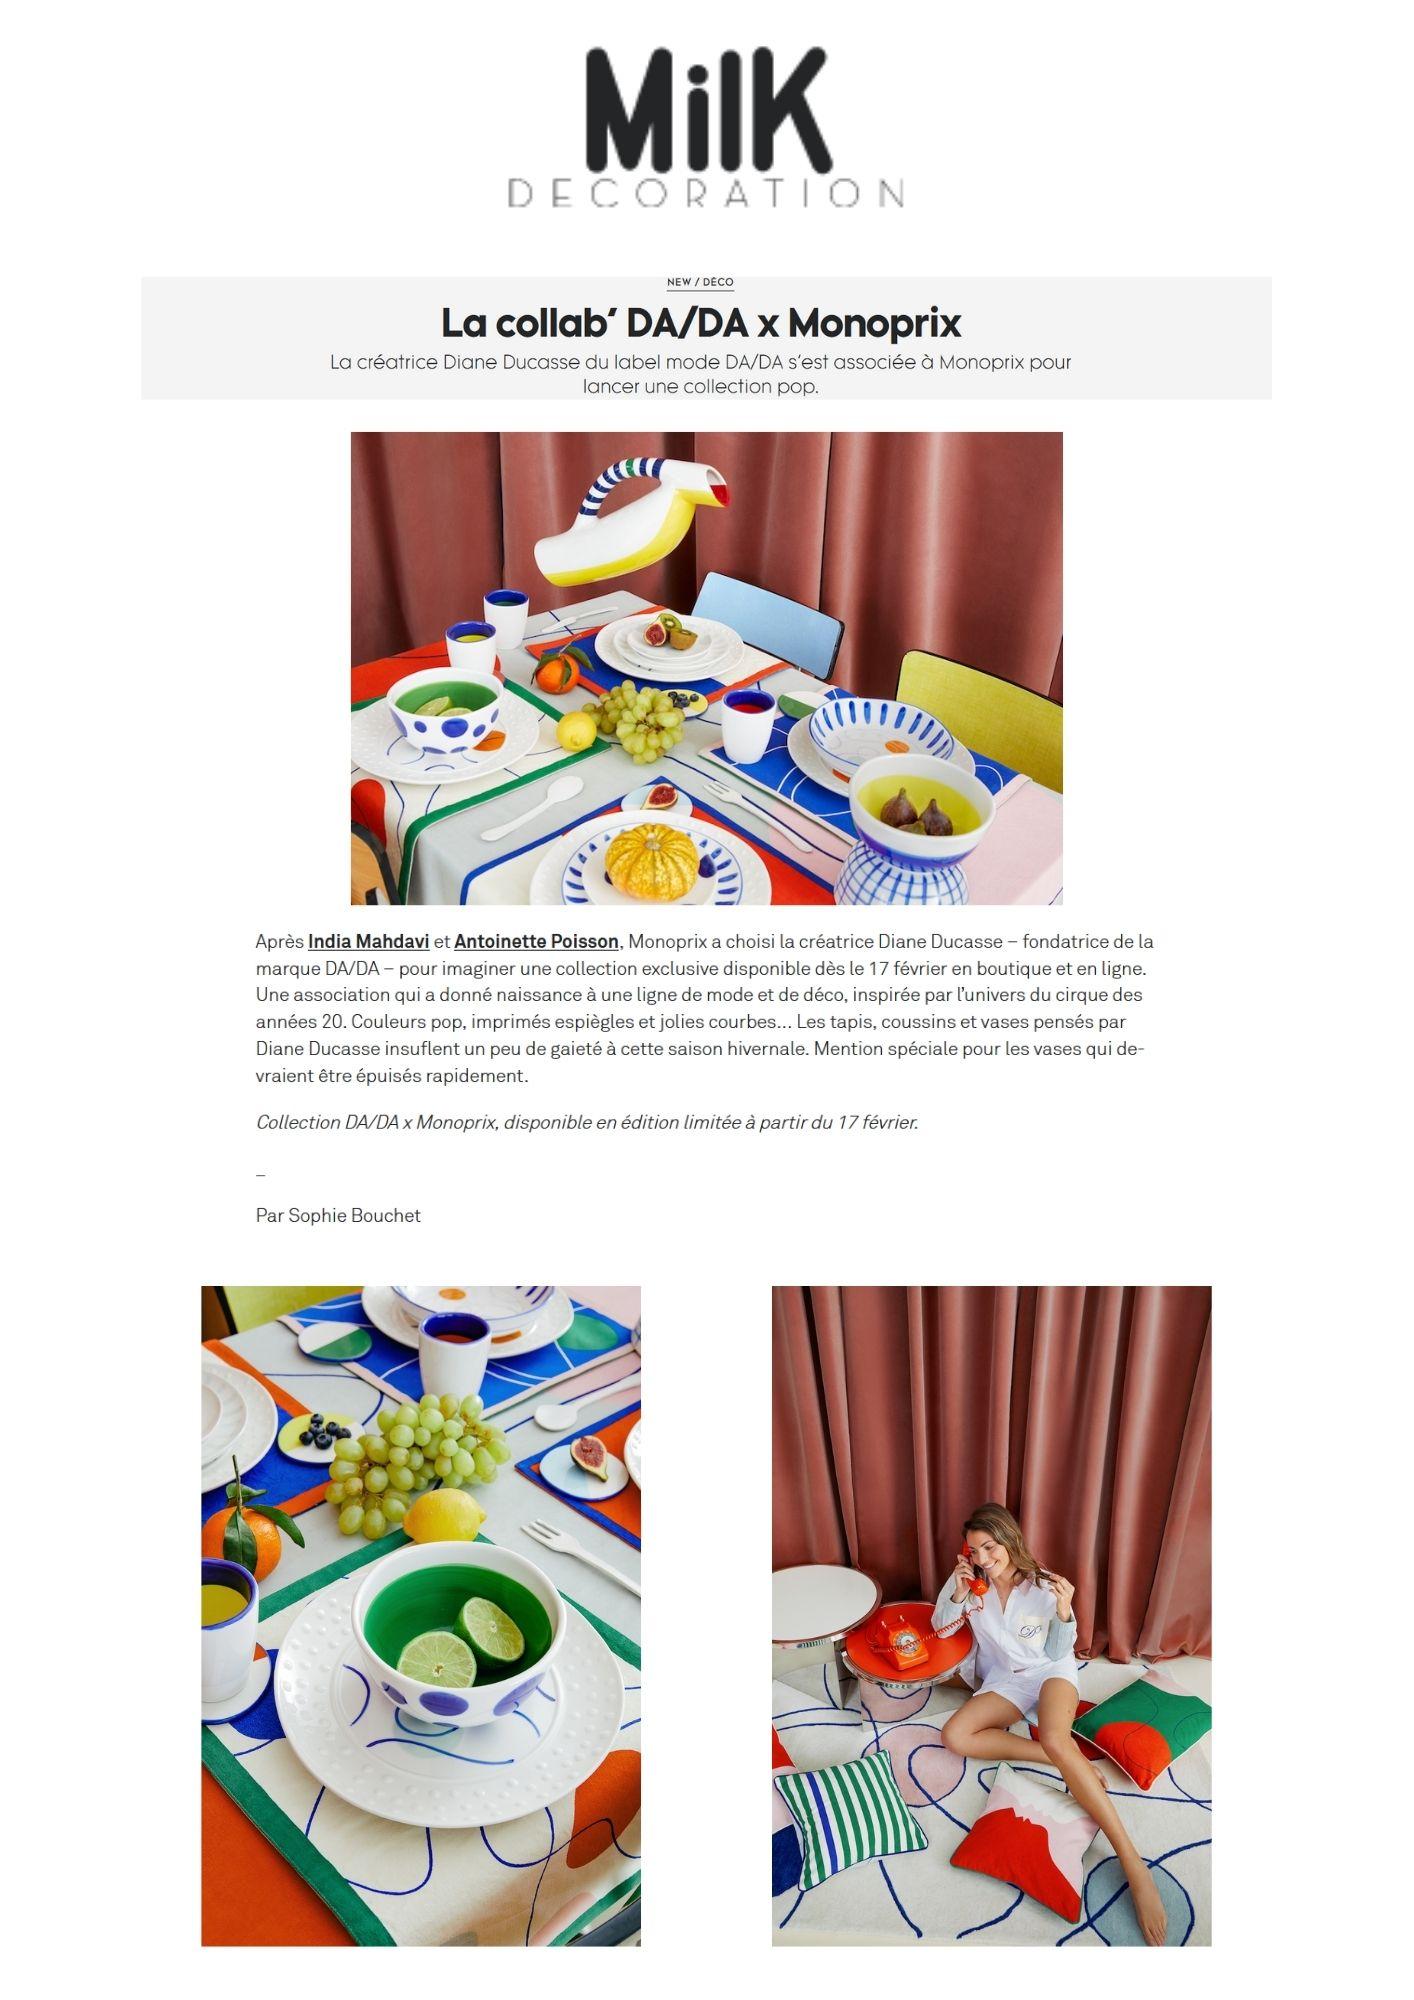 dada-diane-ducasse-milk-decoration-presse-janvier-2021